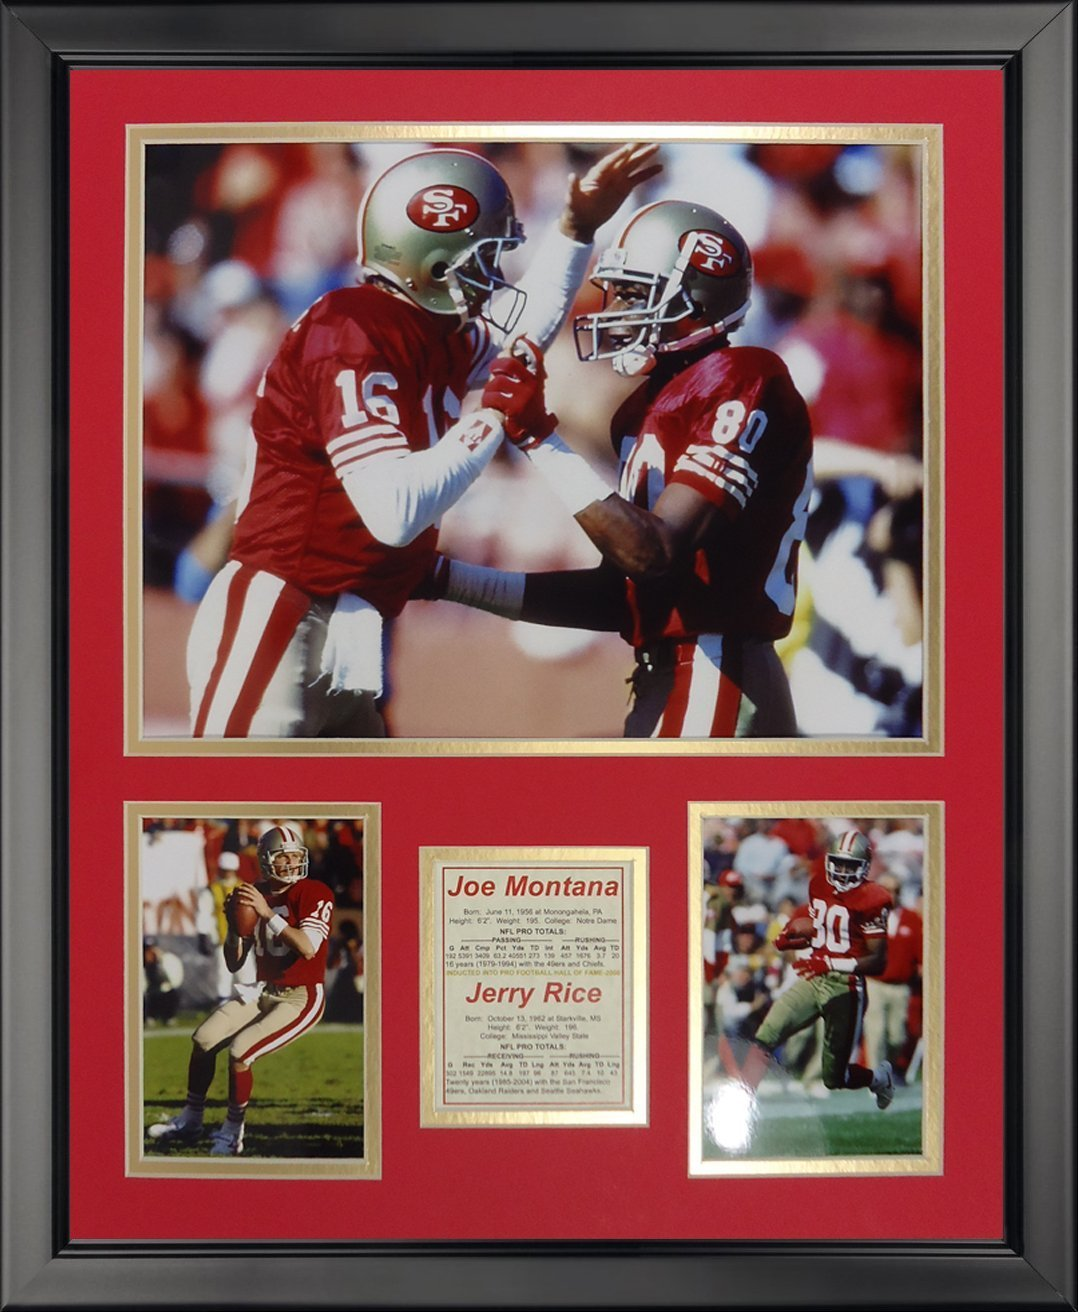 Legends Never Die San Francisco 49ers - Montana-Rice Framed Photo Collage, 16 x 20 16 x 20 19644U